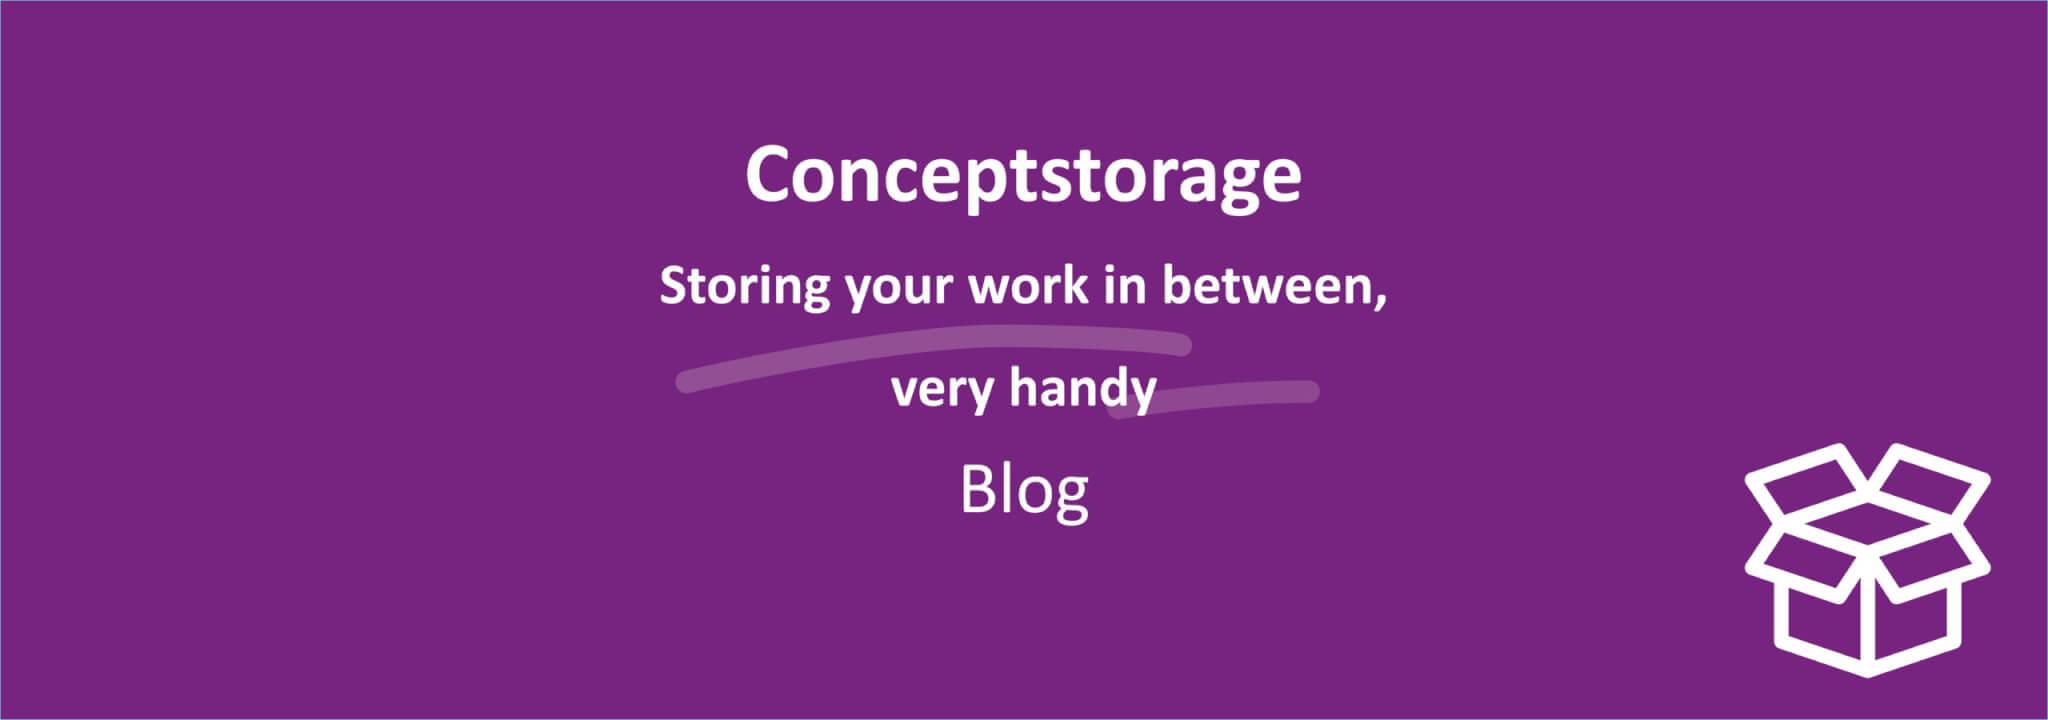 Concept storage